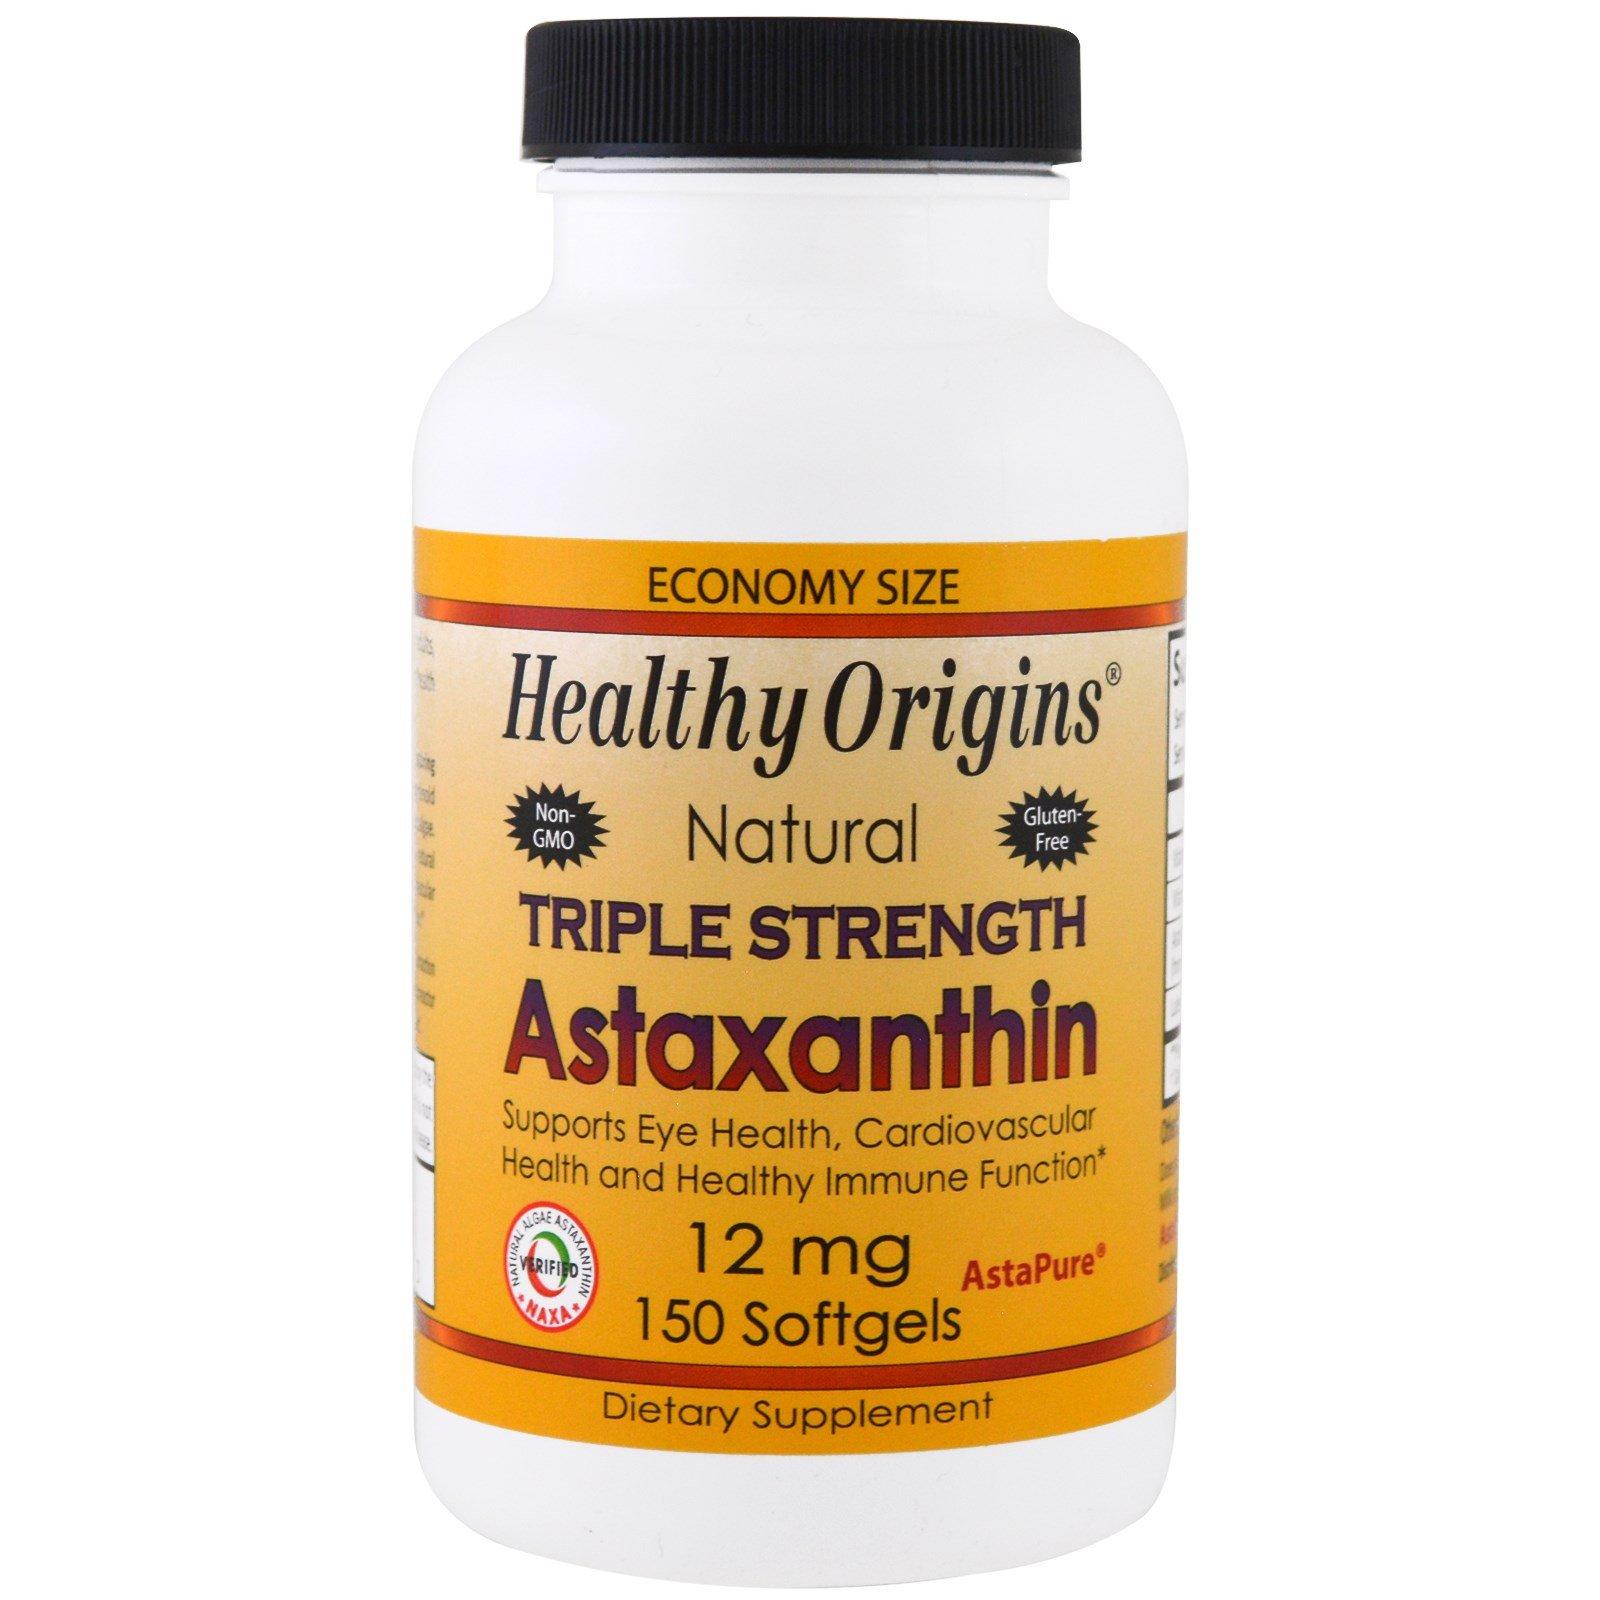 Healthy Origins, Triple Strength Astaxanthin, 12 mg, 150 Softgels - 3PC